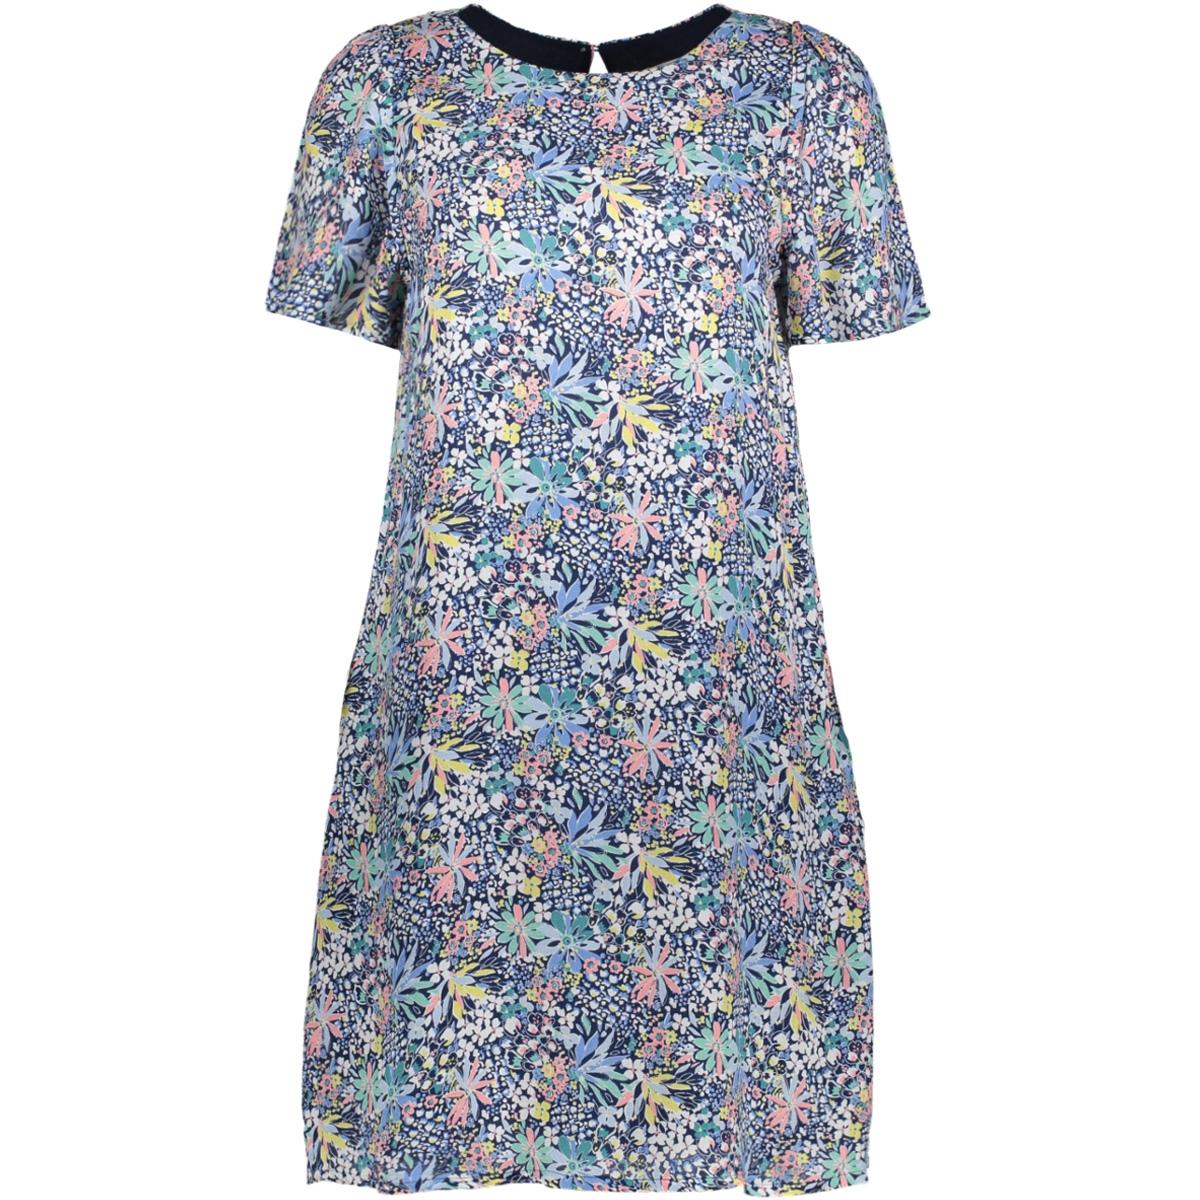 058ee1e016 esprit jurk e400